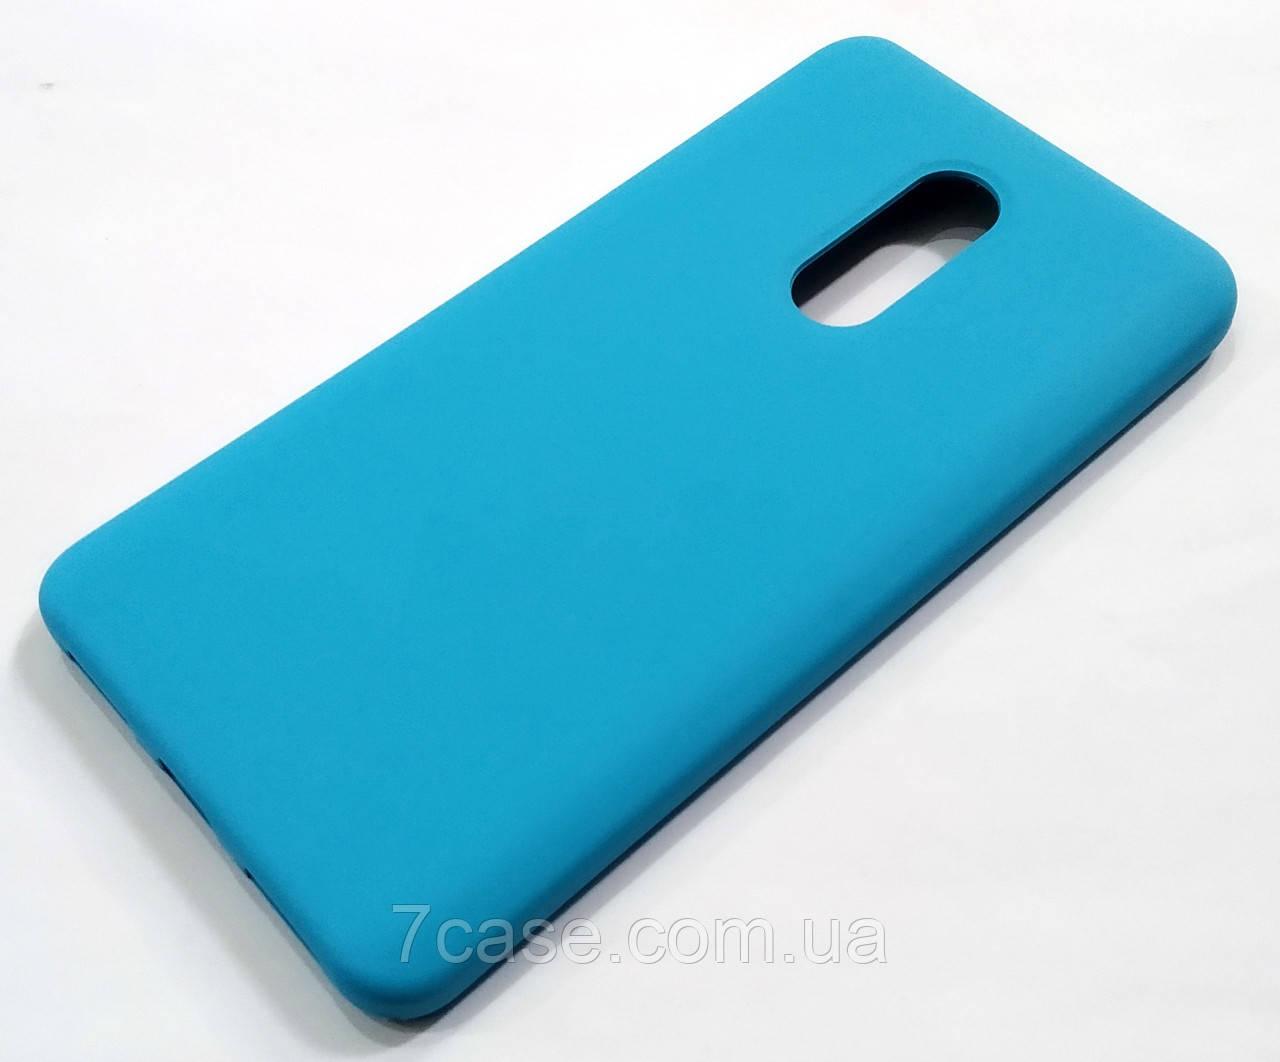 Чехол Silicone Case для Xiaomi Redmi Note 4X голубой